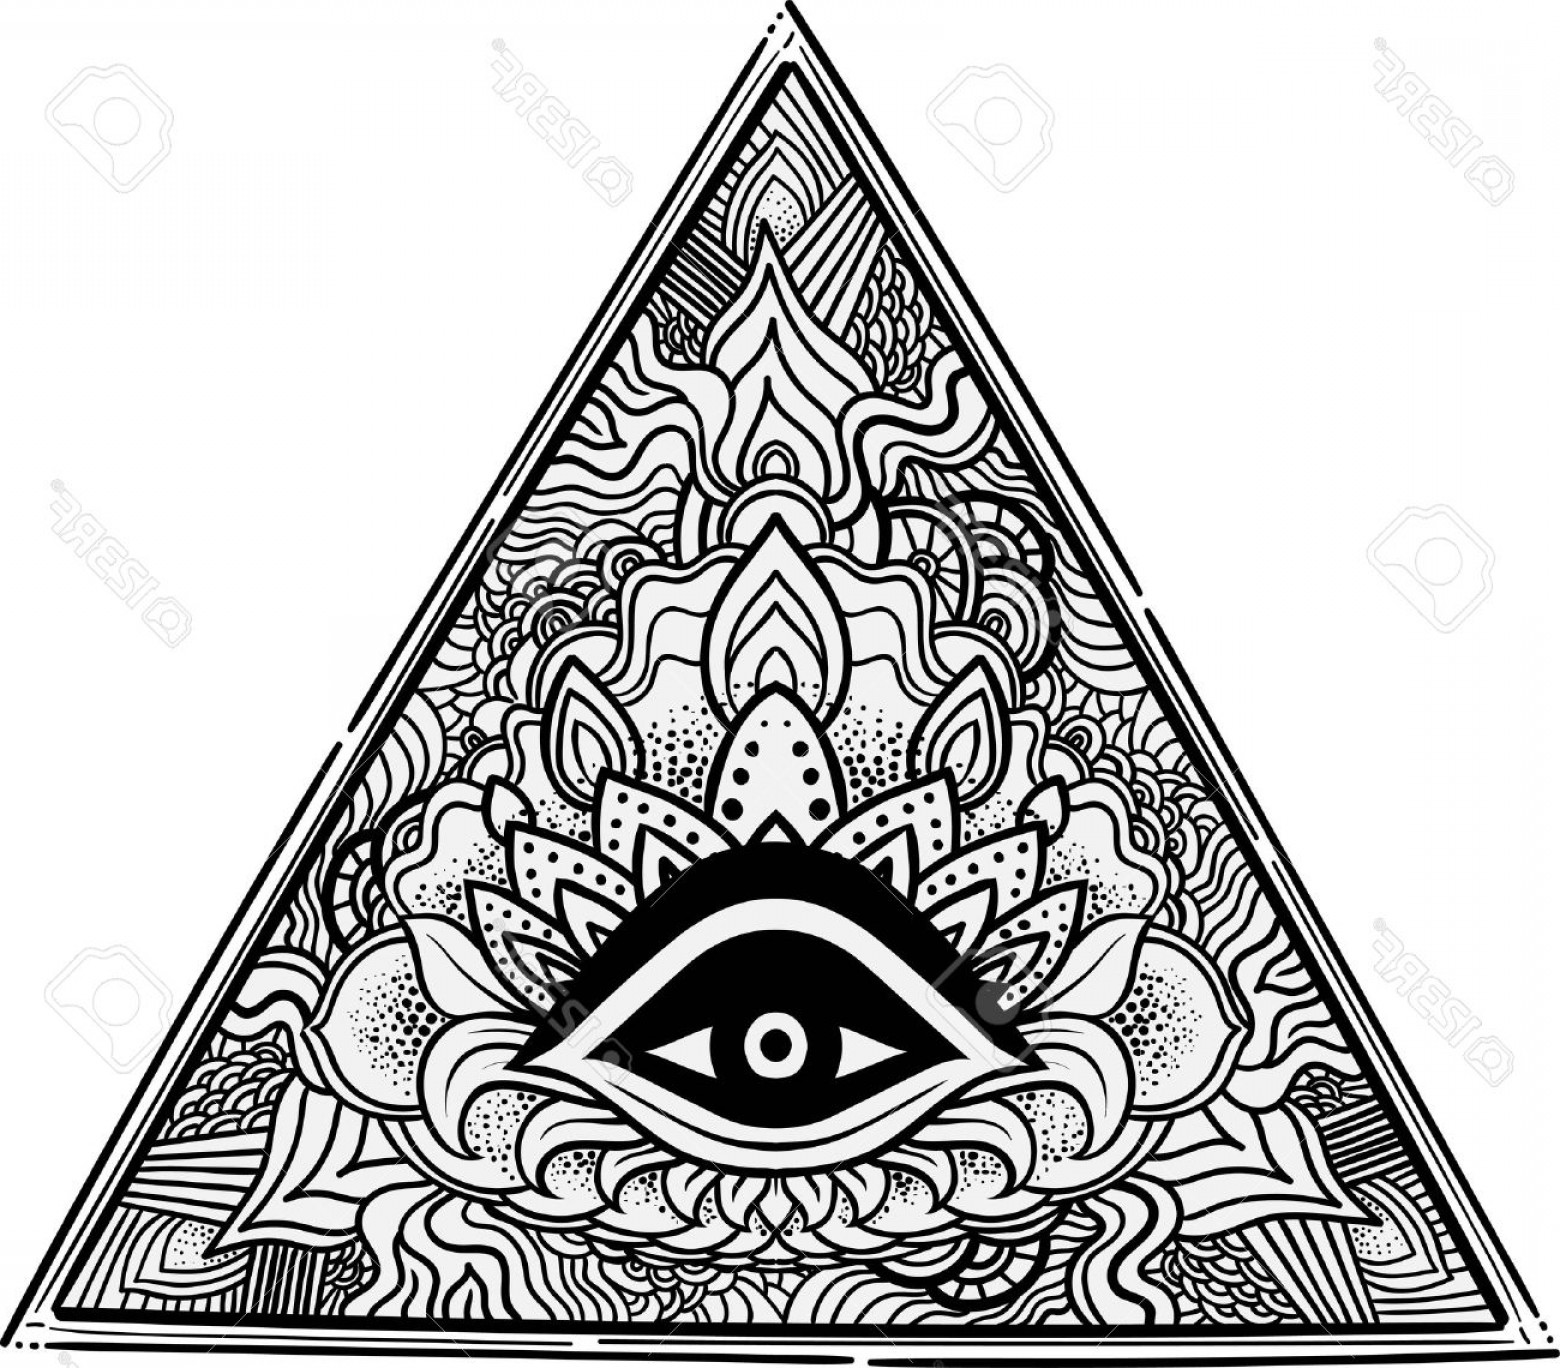 1560x1368 Photostock Vector Eye Of Providence Masonic Symbol All Seeing Eye